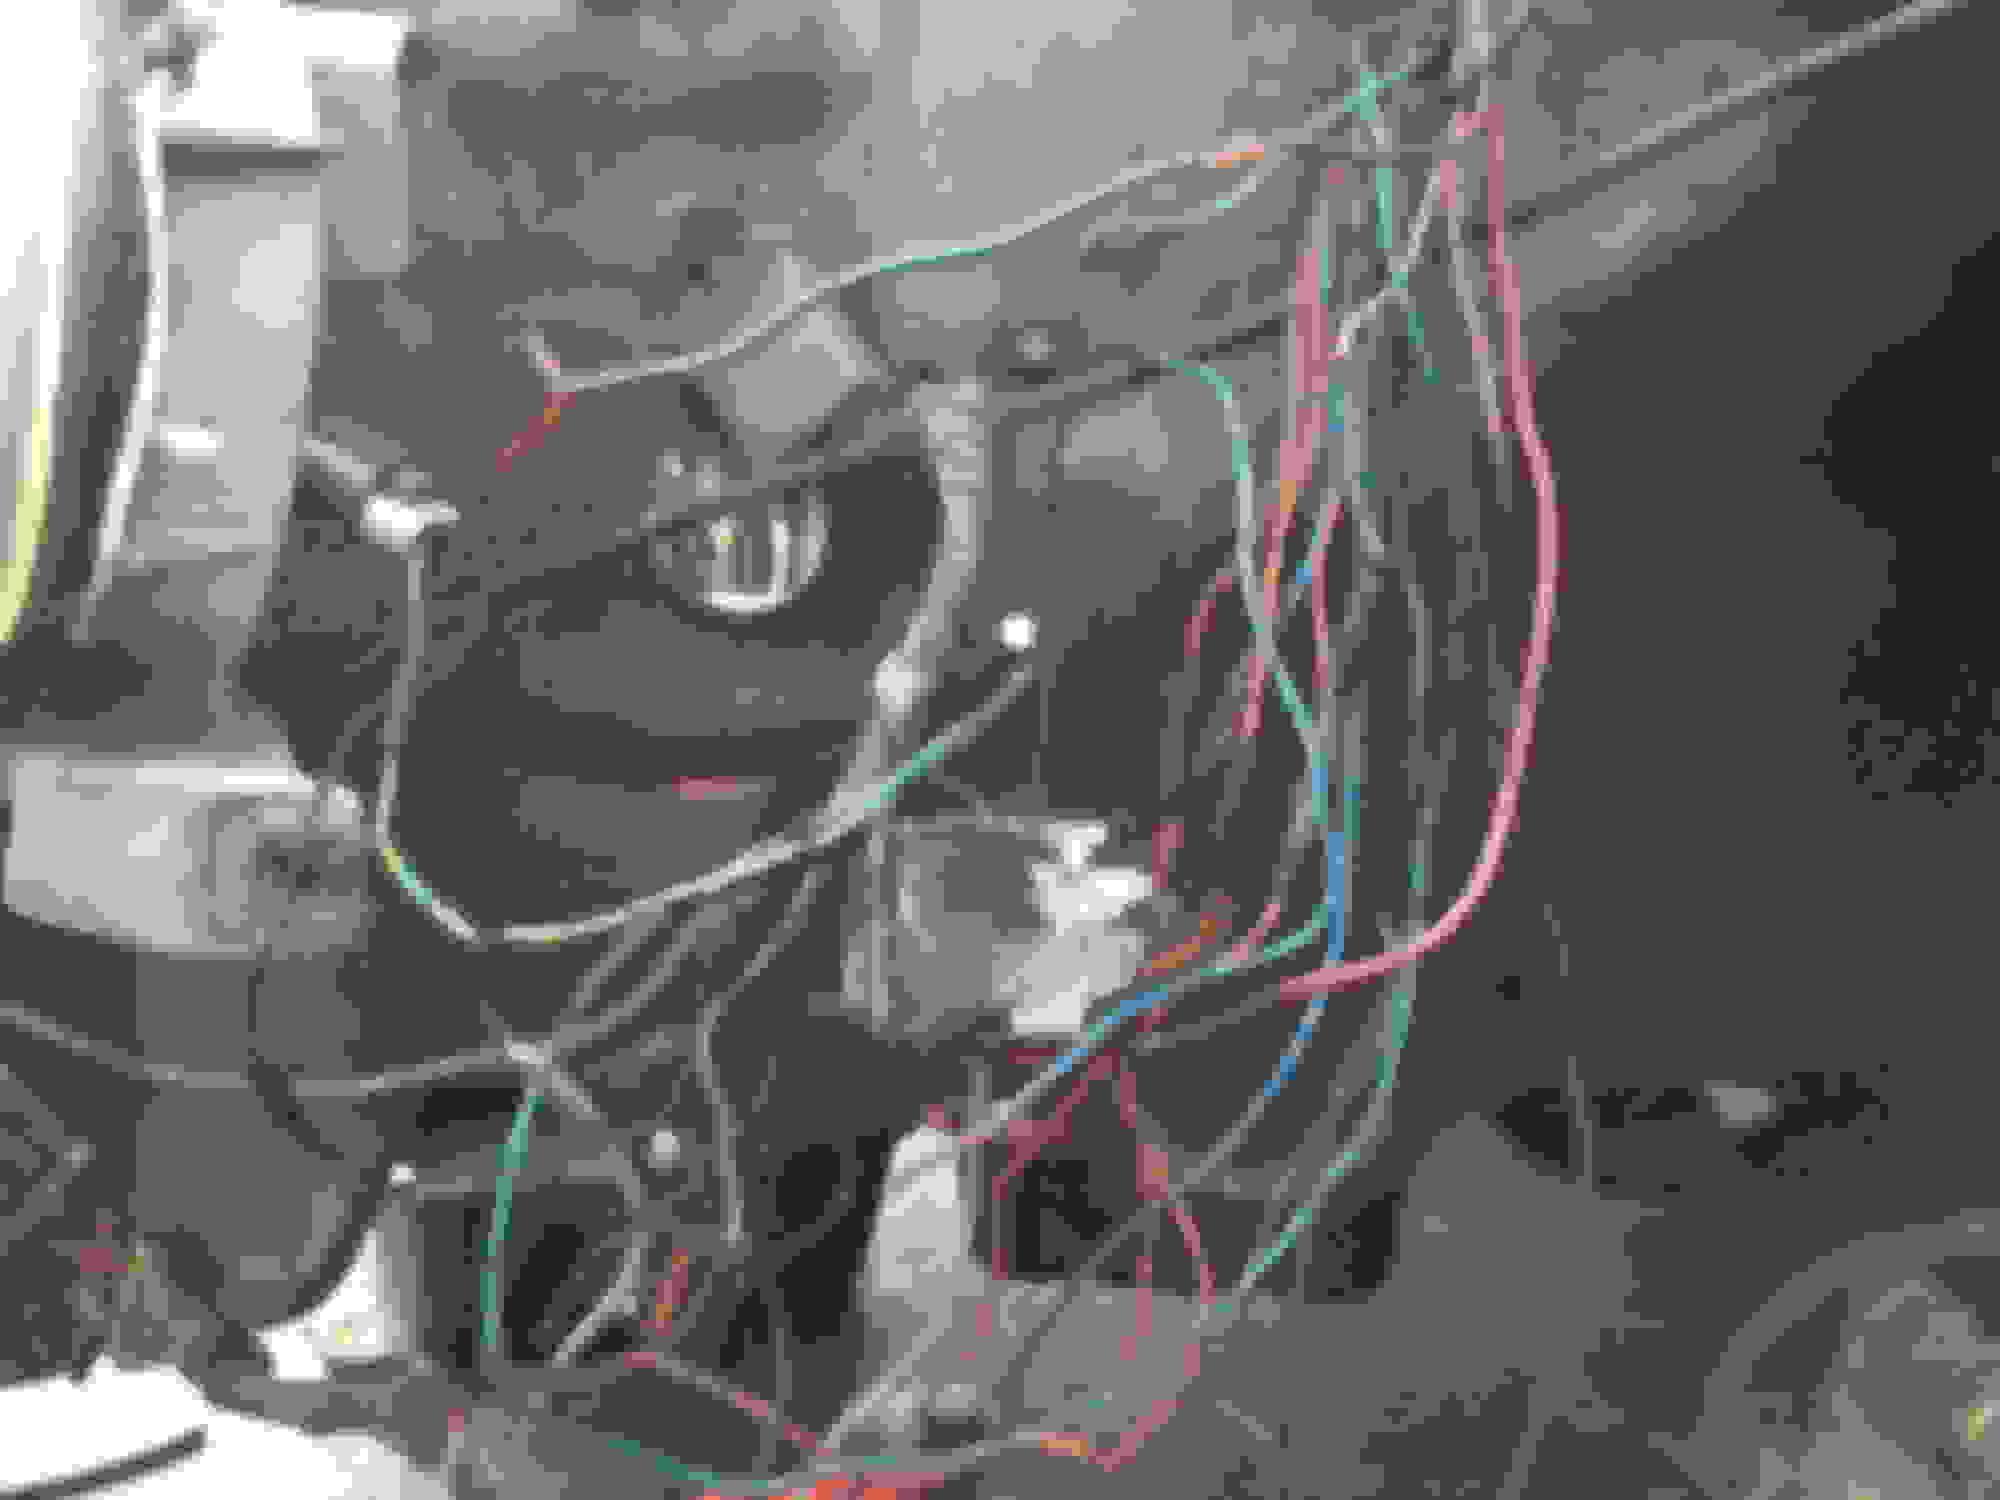 jdm integra front turn signal wiring help honda tech civic turn signals and hazards dont